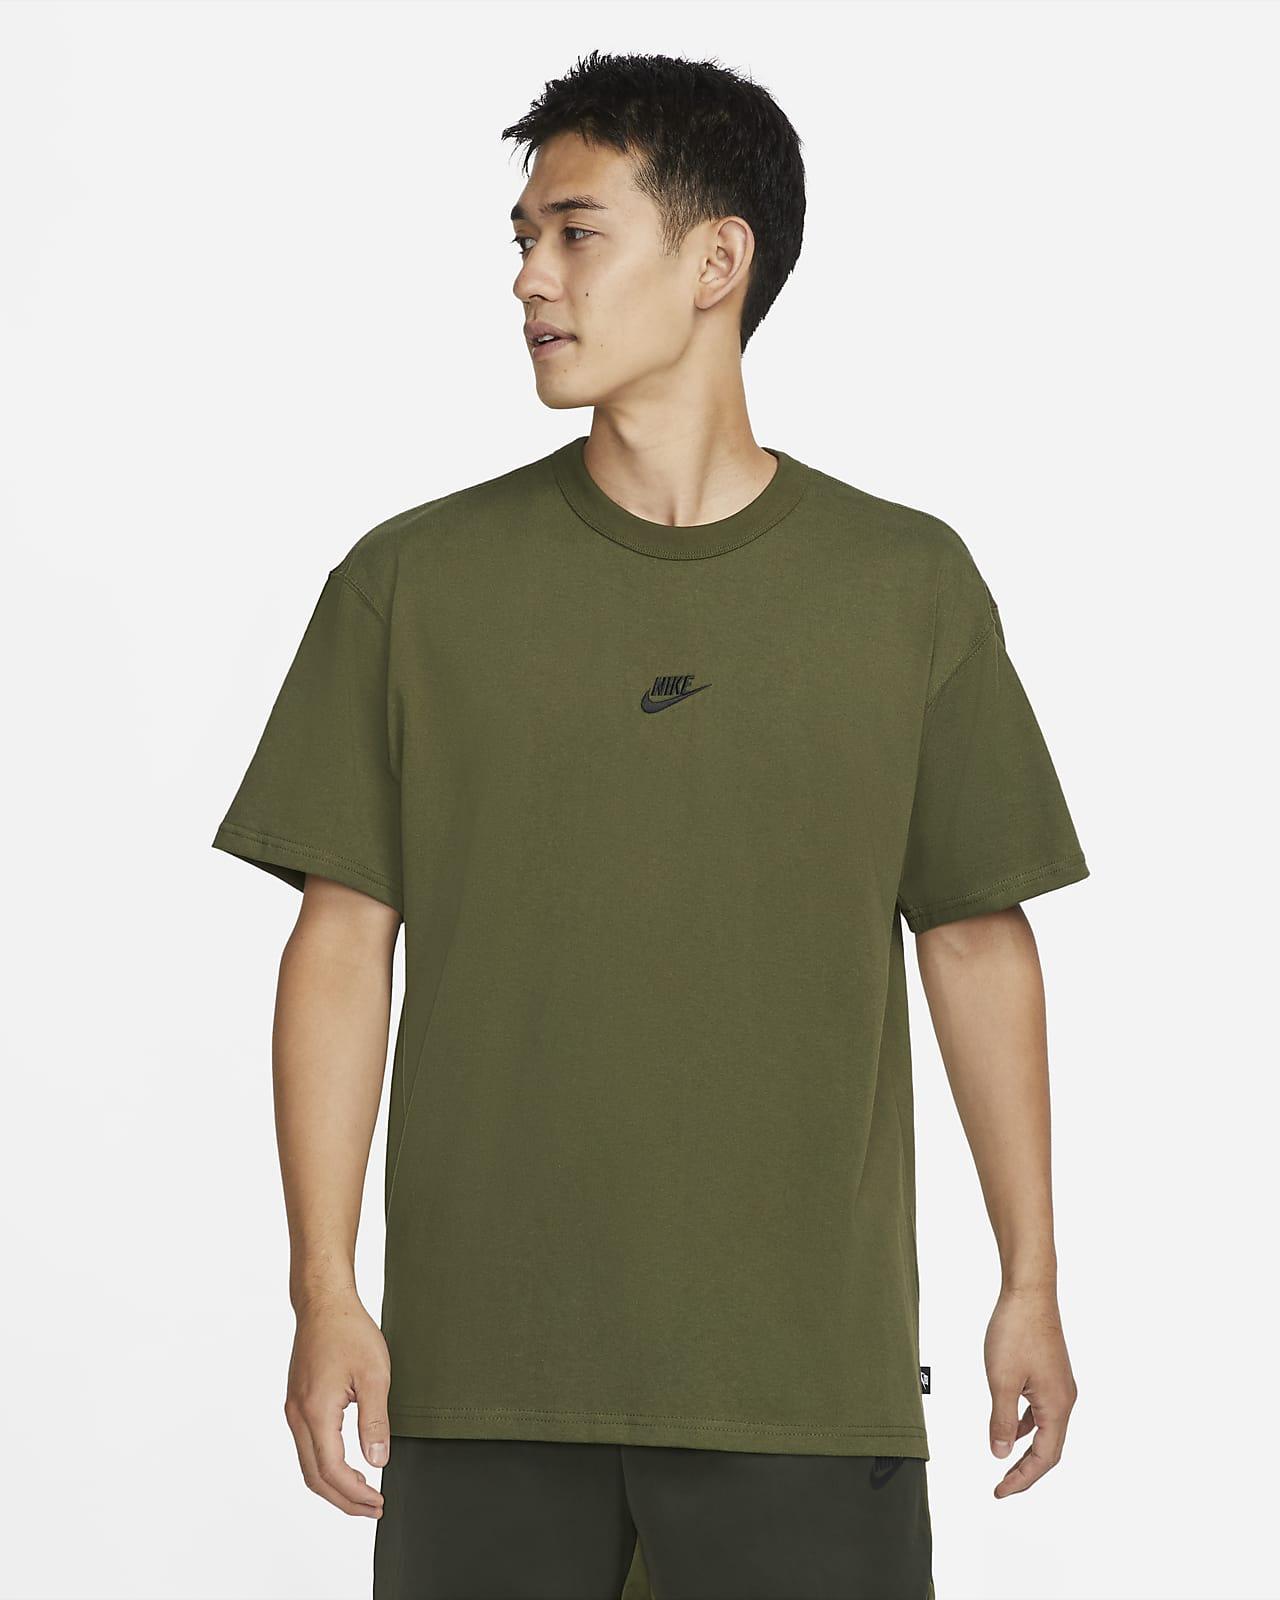 Tee-shirt Nike Sportswear Premium Essential pour Homme